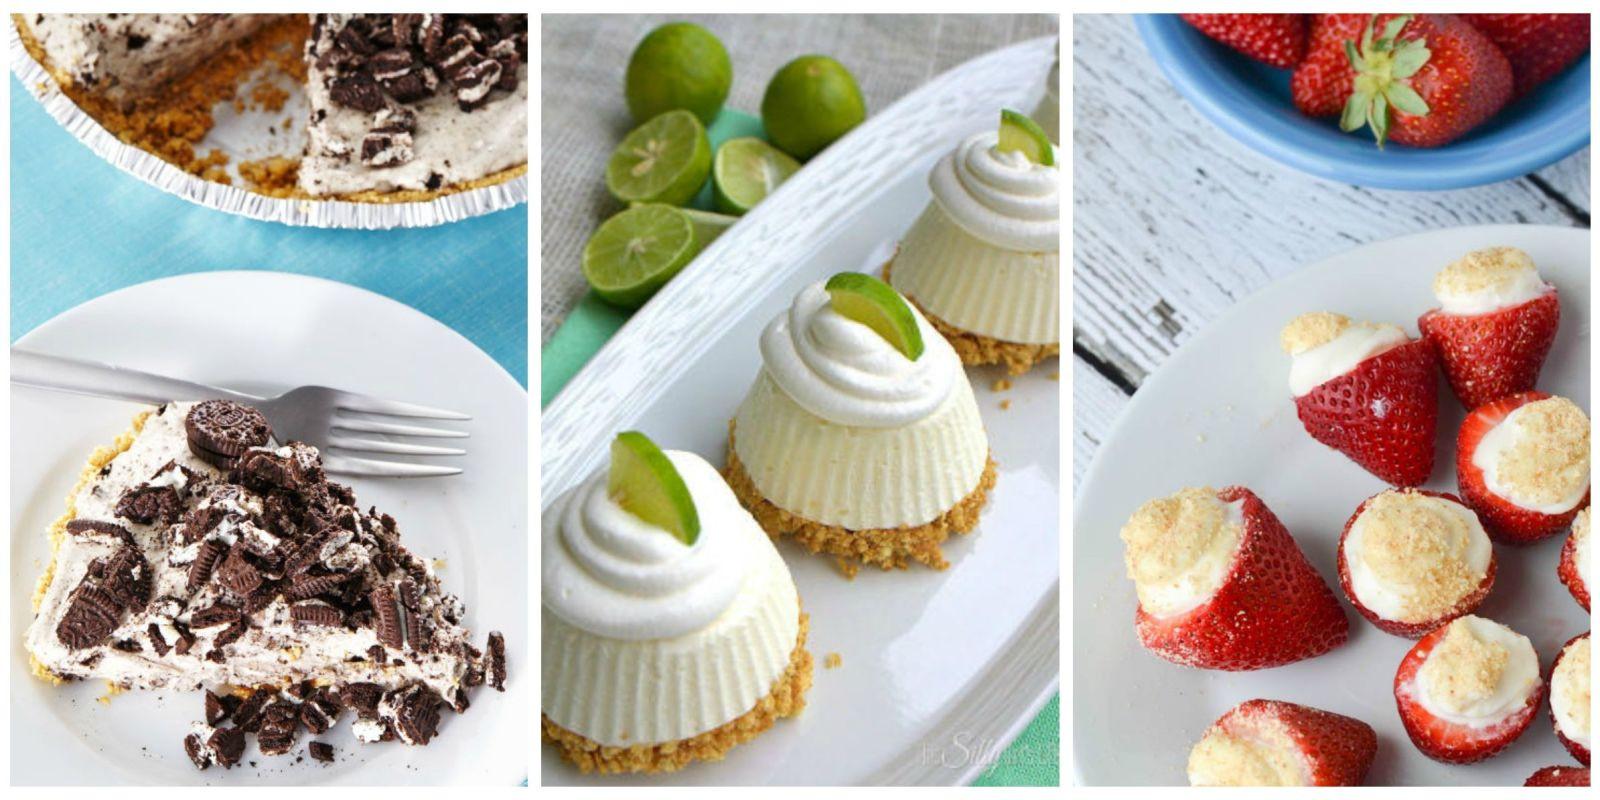 Easy Summer Dessert Recipes  57 Easy Summer Desserts Best Recipes for Frozen Summer